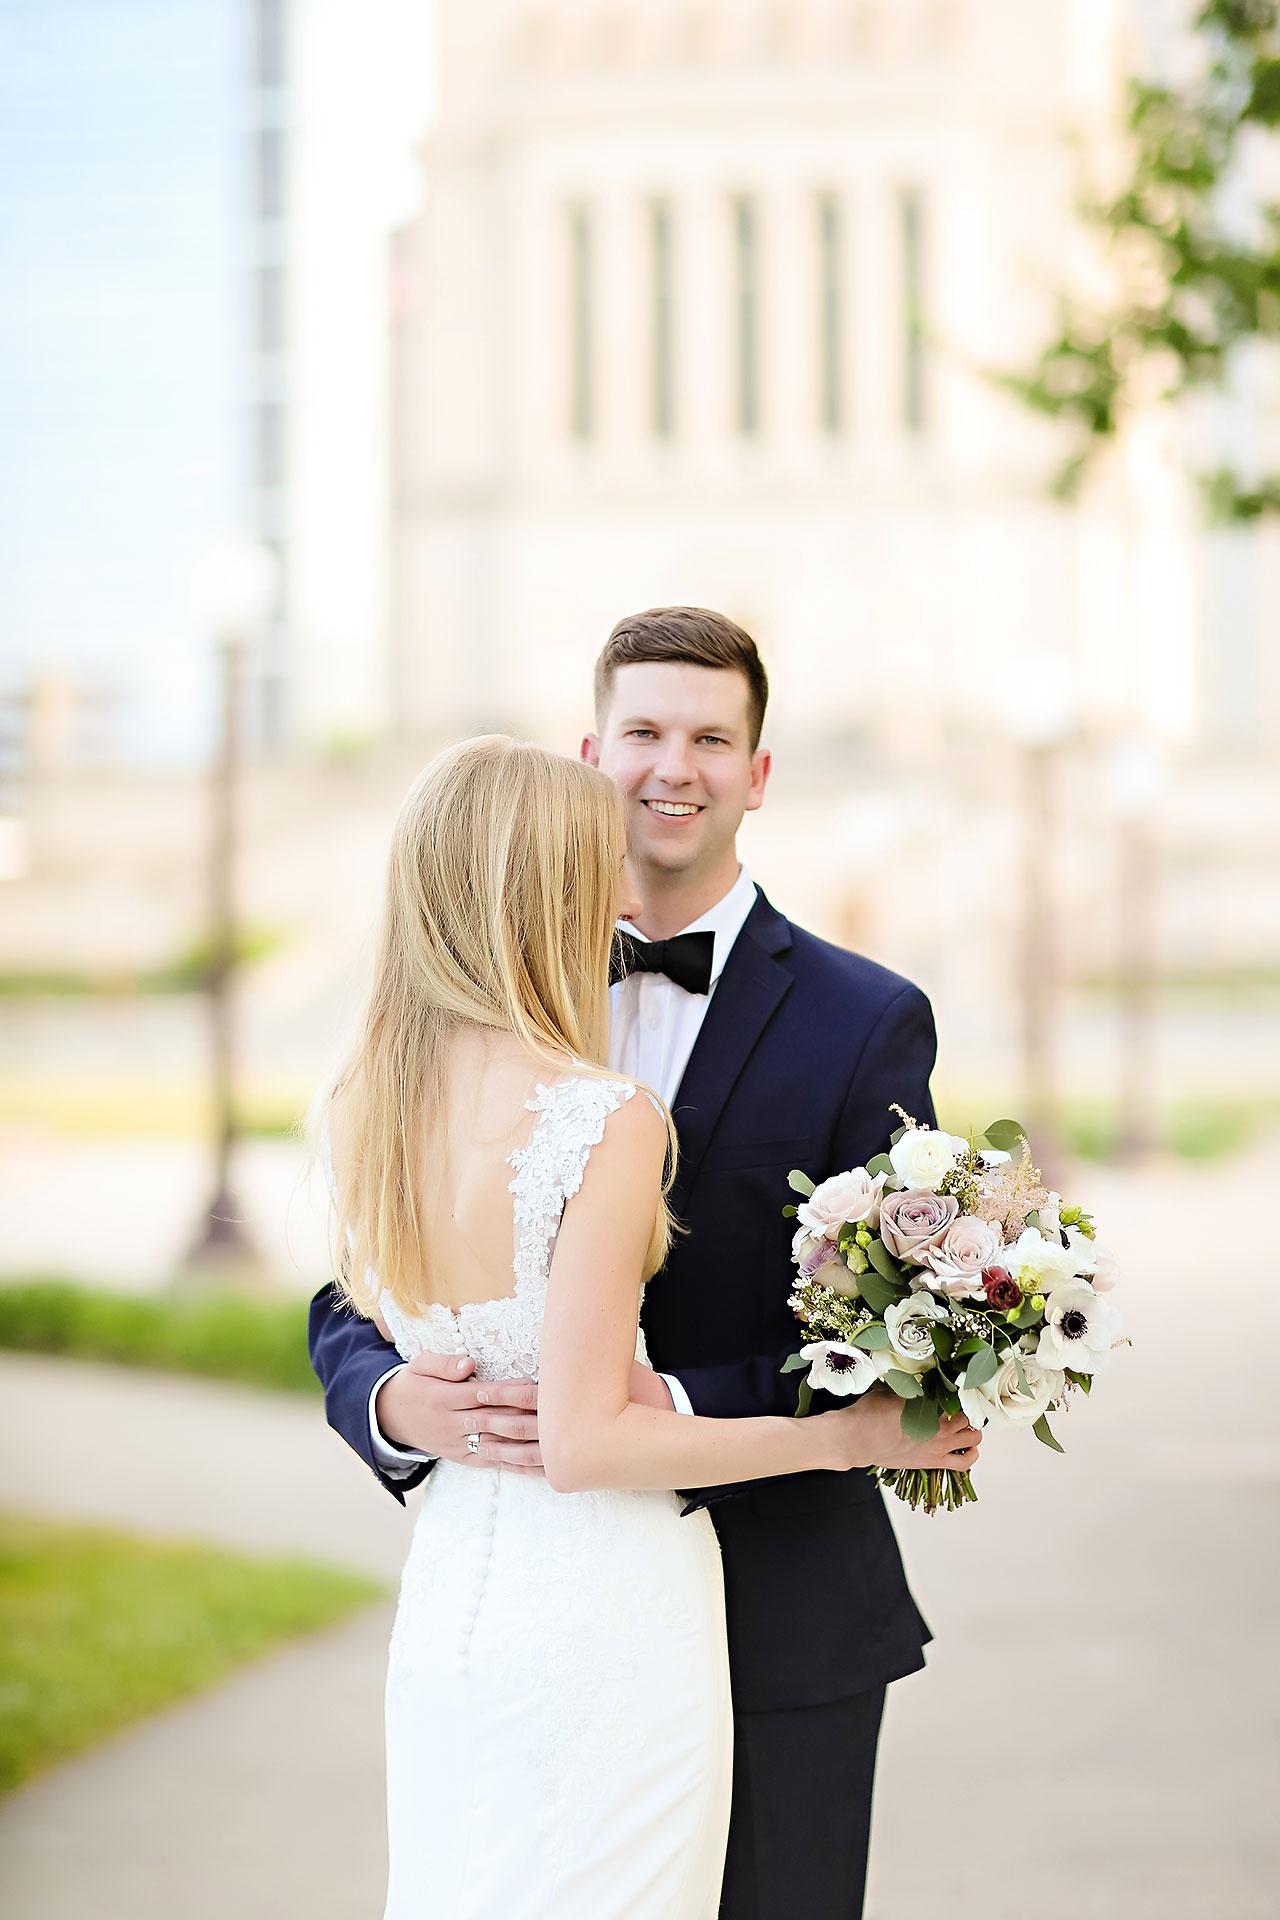 Molly Declan Scottish Rite Indianapolis Wedding 201